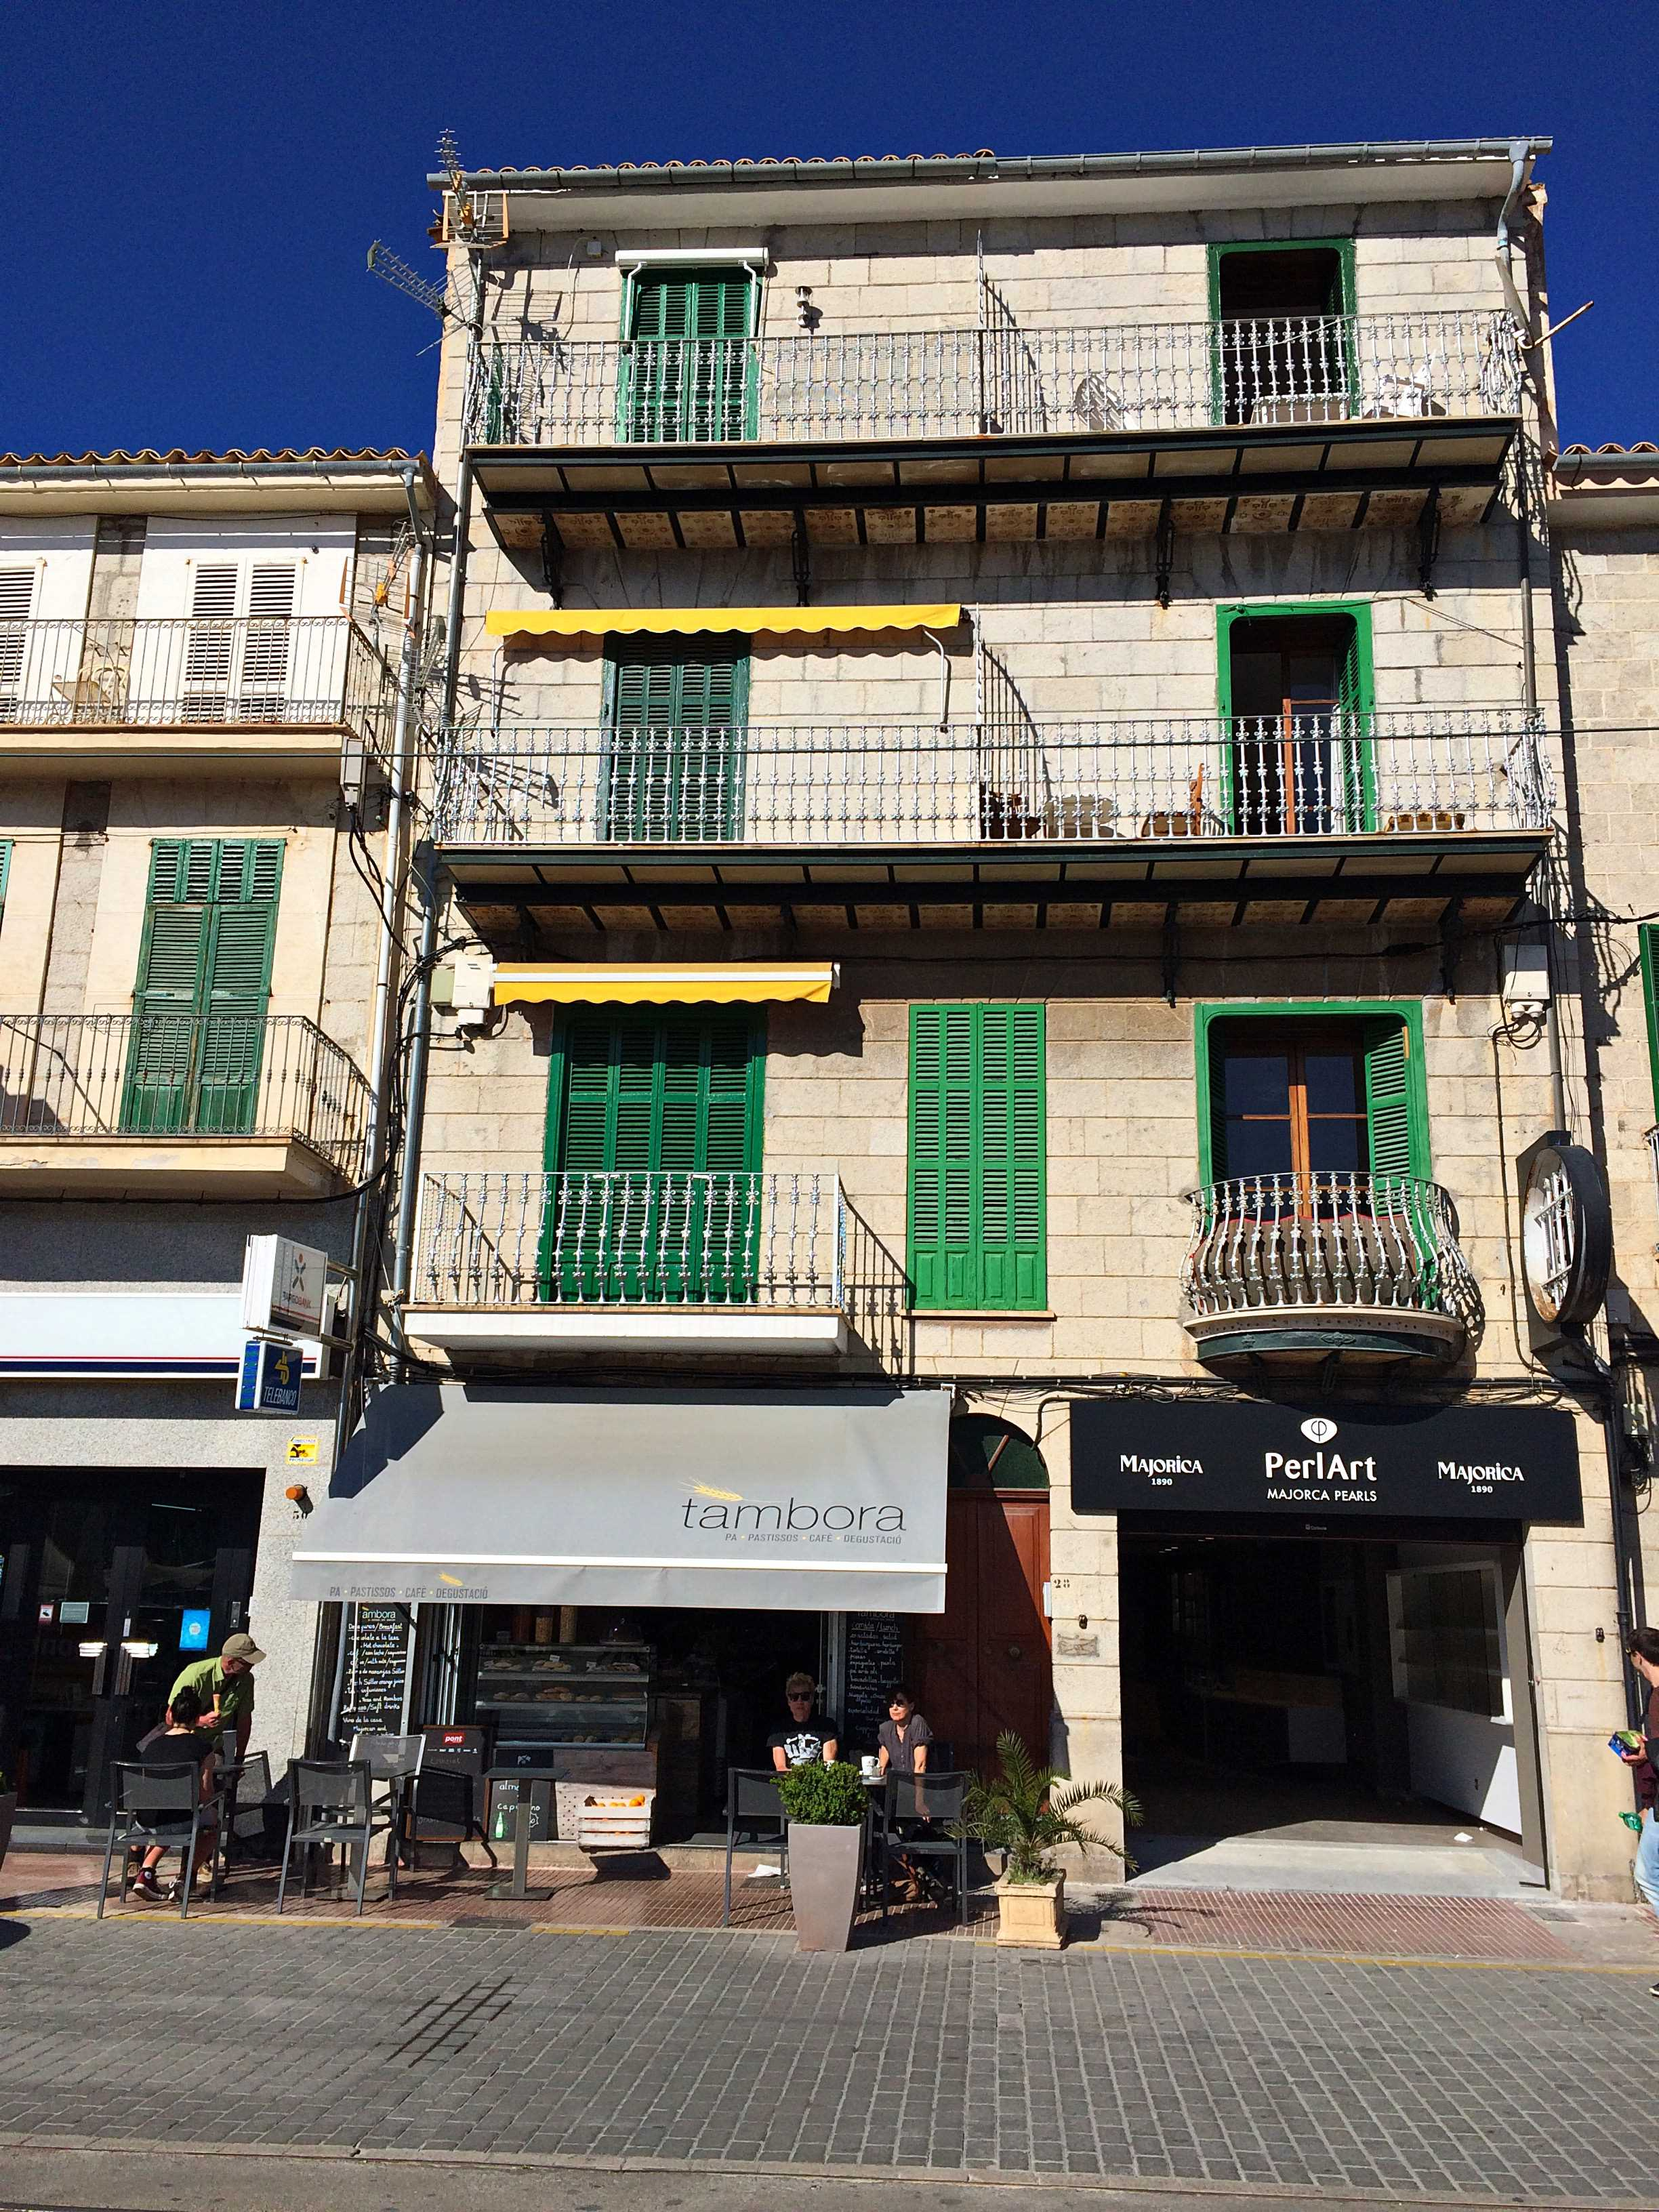 Mein perfektes Mallorca Wochenende staedtereisen sonne land und leute mallorca familie europa  tui berlin mallorca port de soller tambora